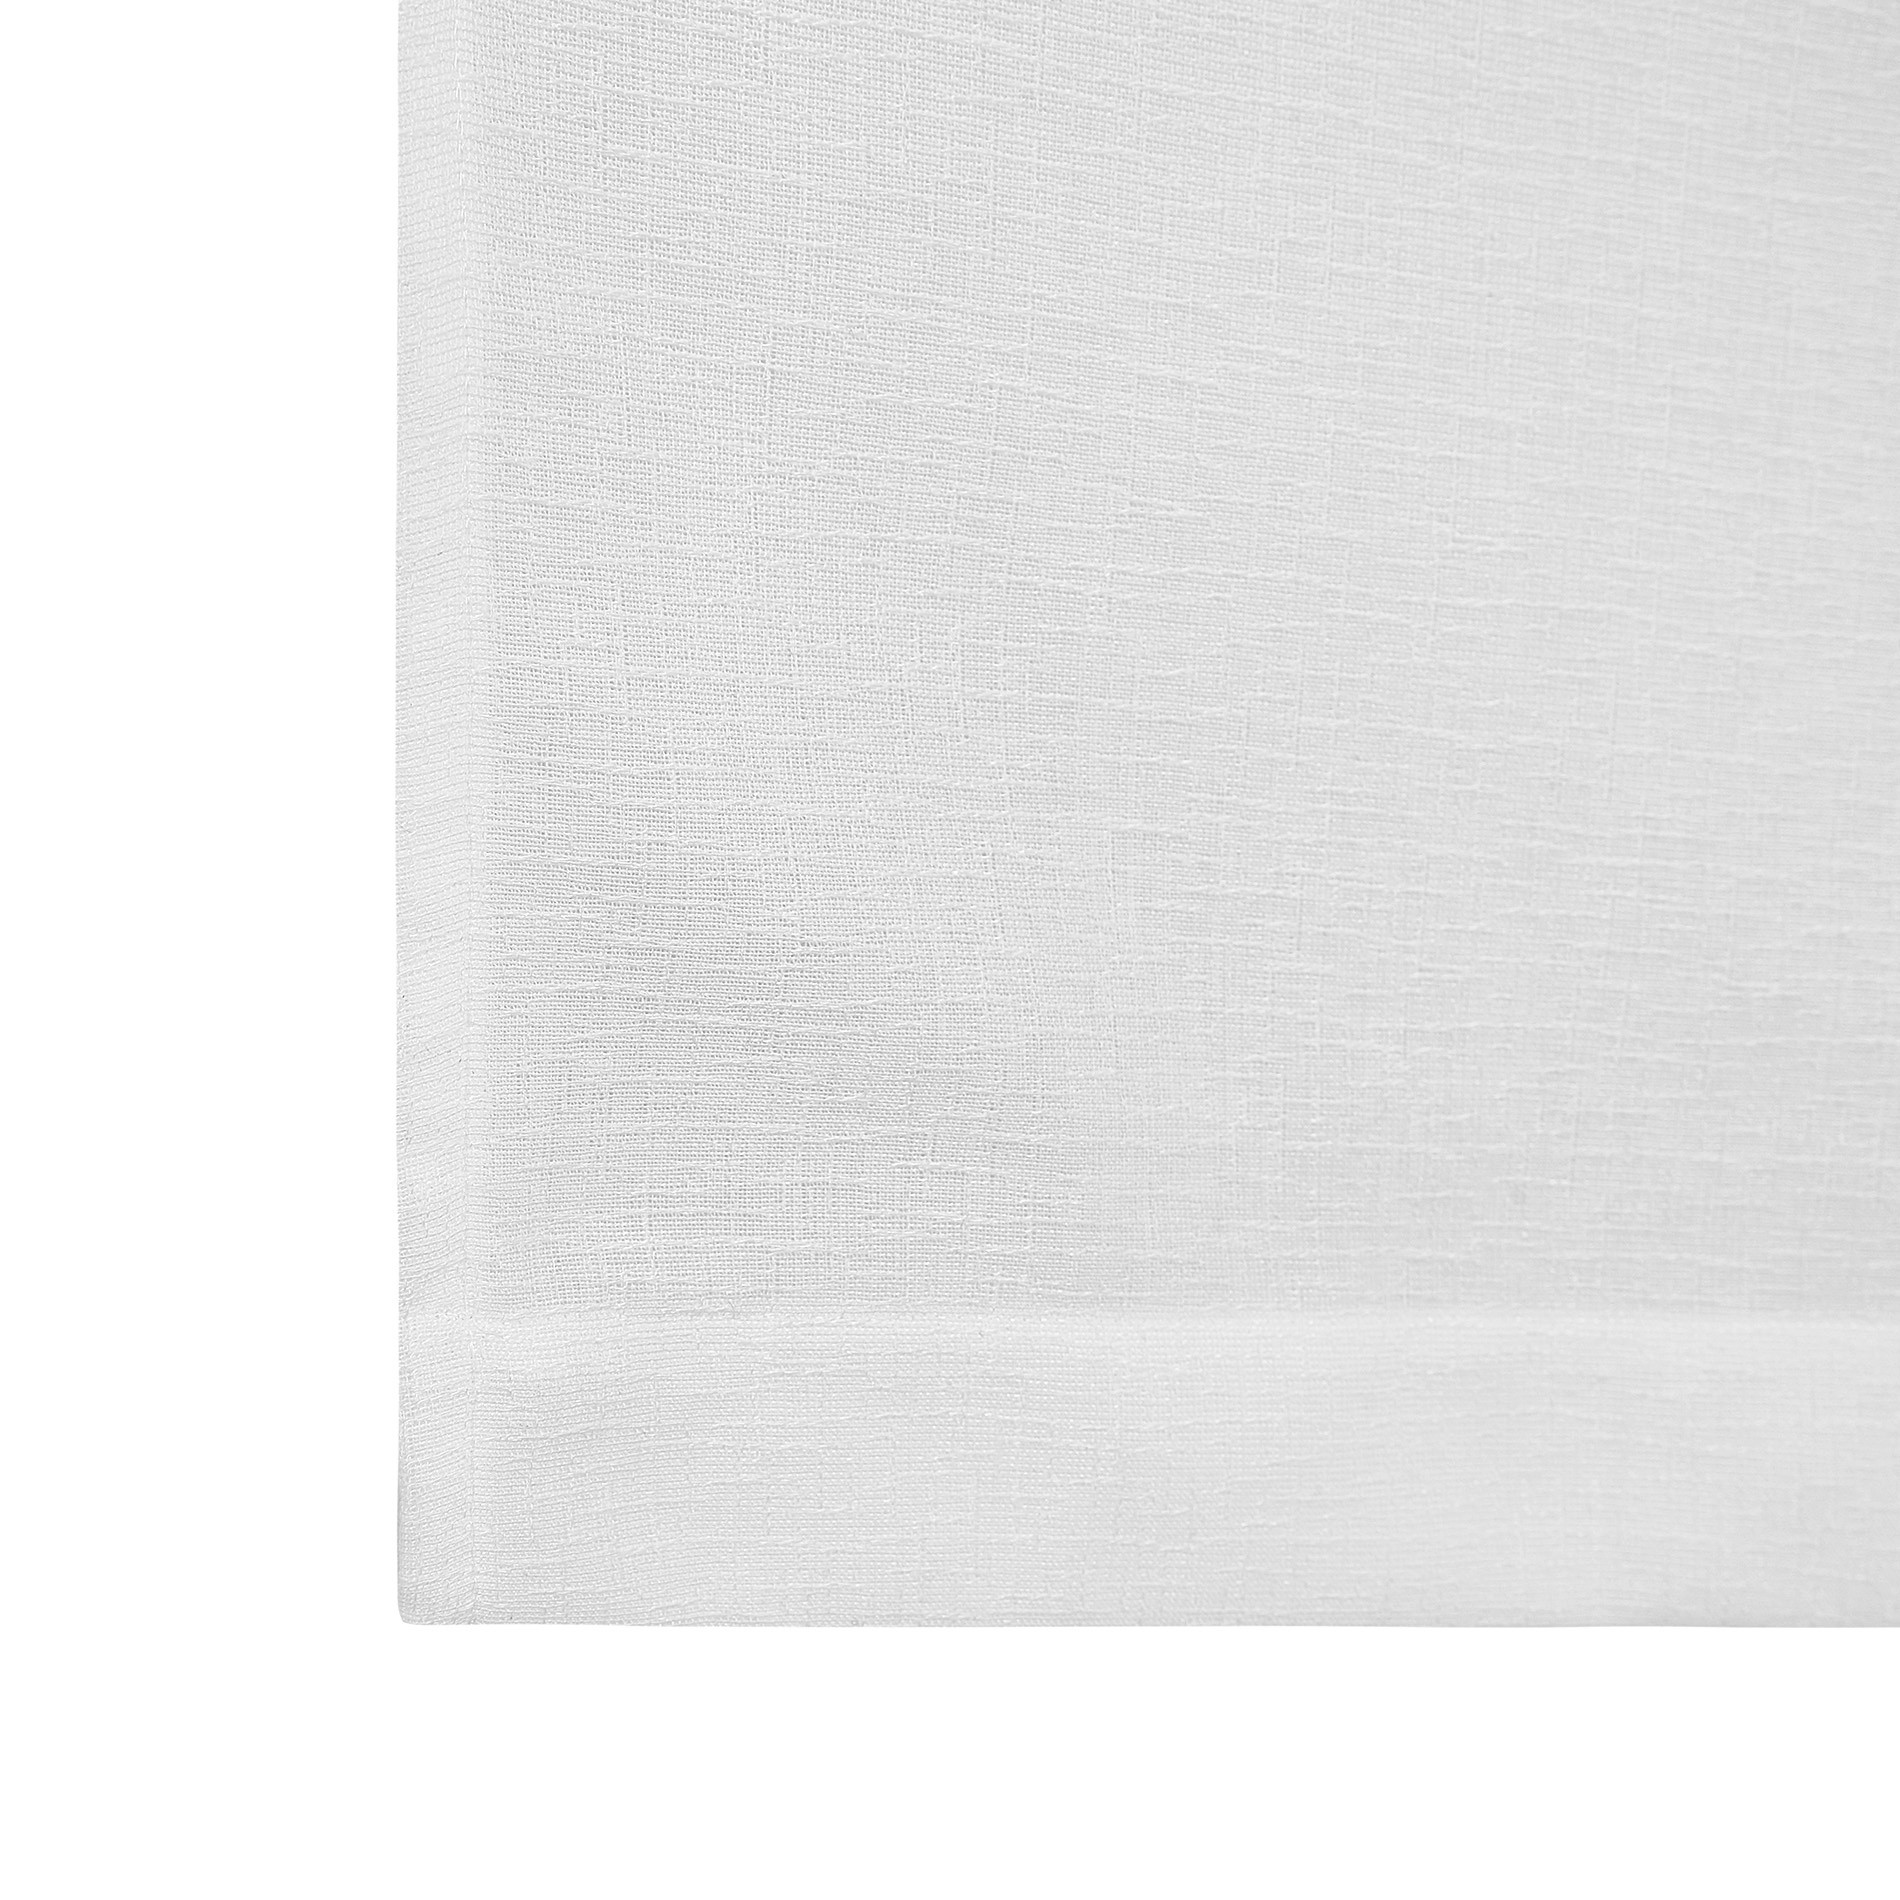 Tendina effetto fiammato tinta unita, Bianco, large image number 3